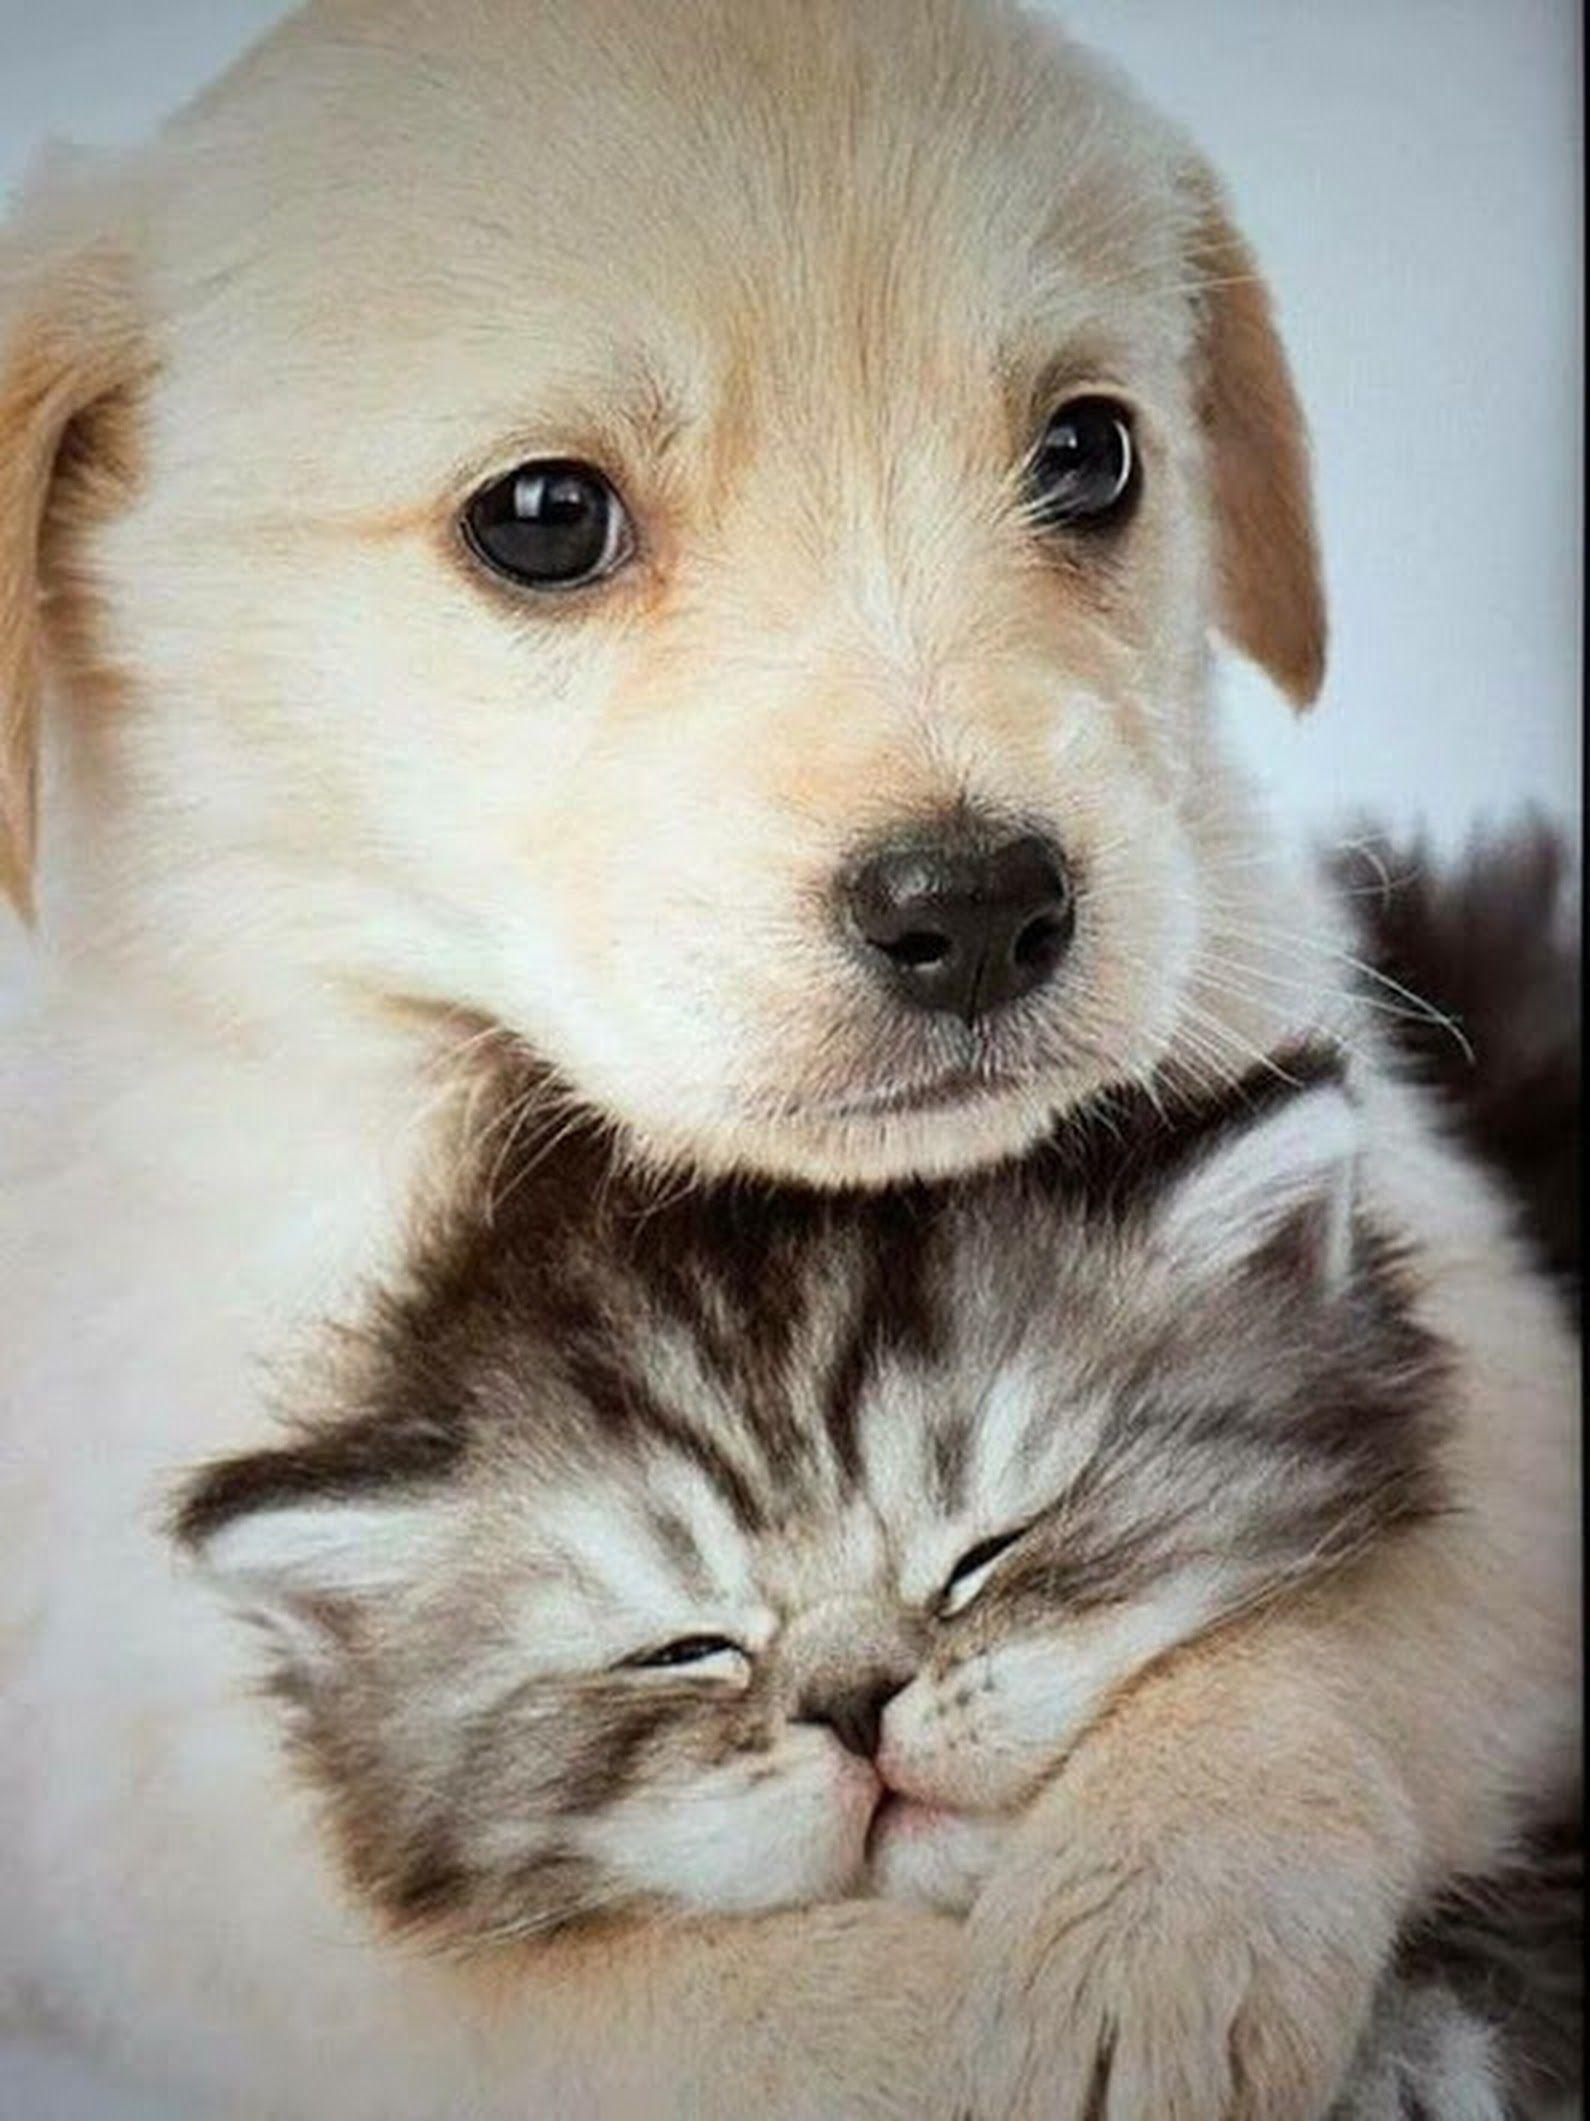 Mehmet Ali Erdem Cute Cats And Dogs Cute Animals Cute Baby Animals